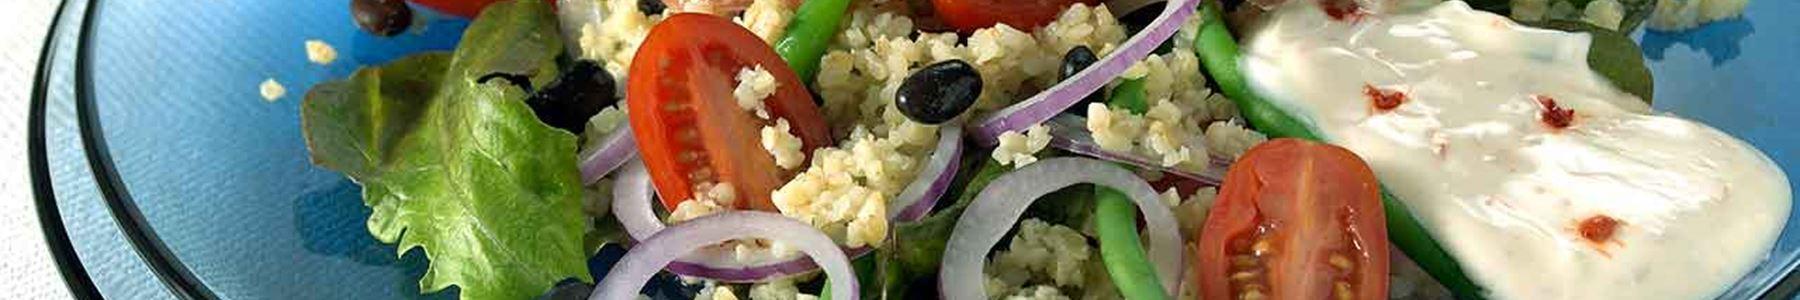 Kalorisnål + Skinka + Bönor